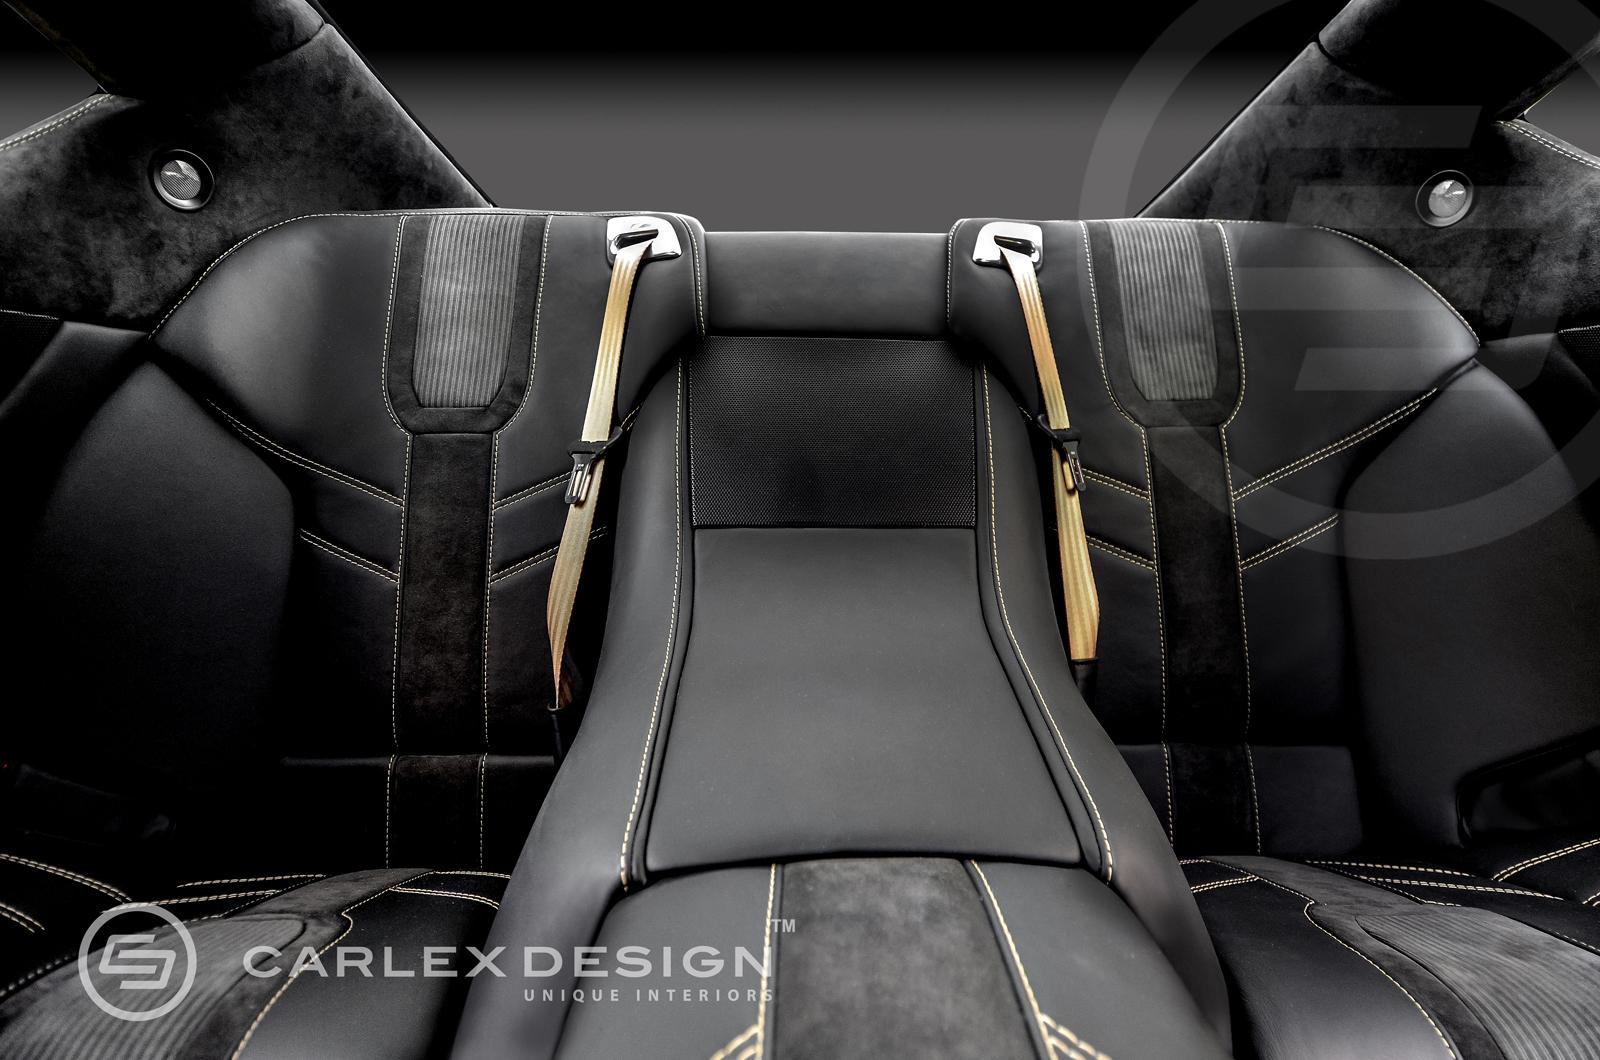 Craftsmanship aston martin db9 by carlex design for Aston martin db9 interior